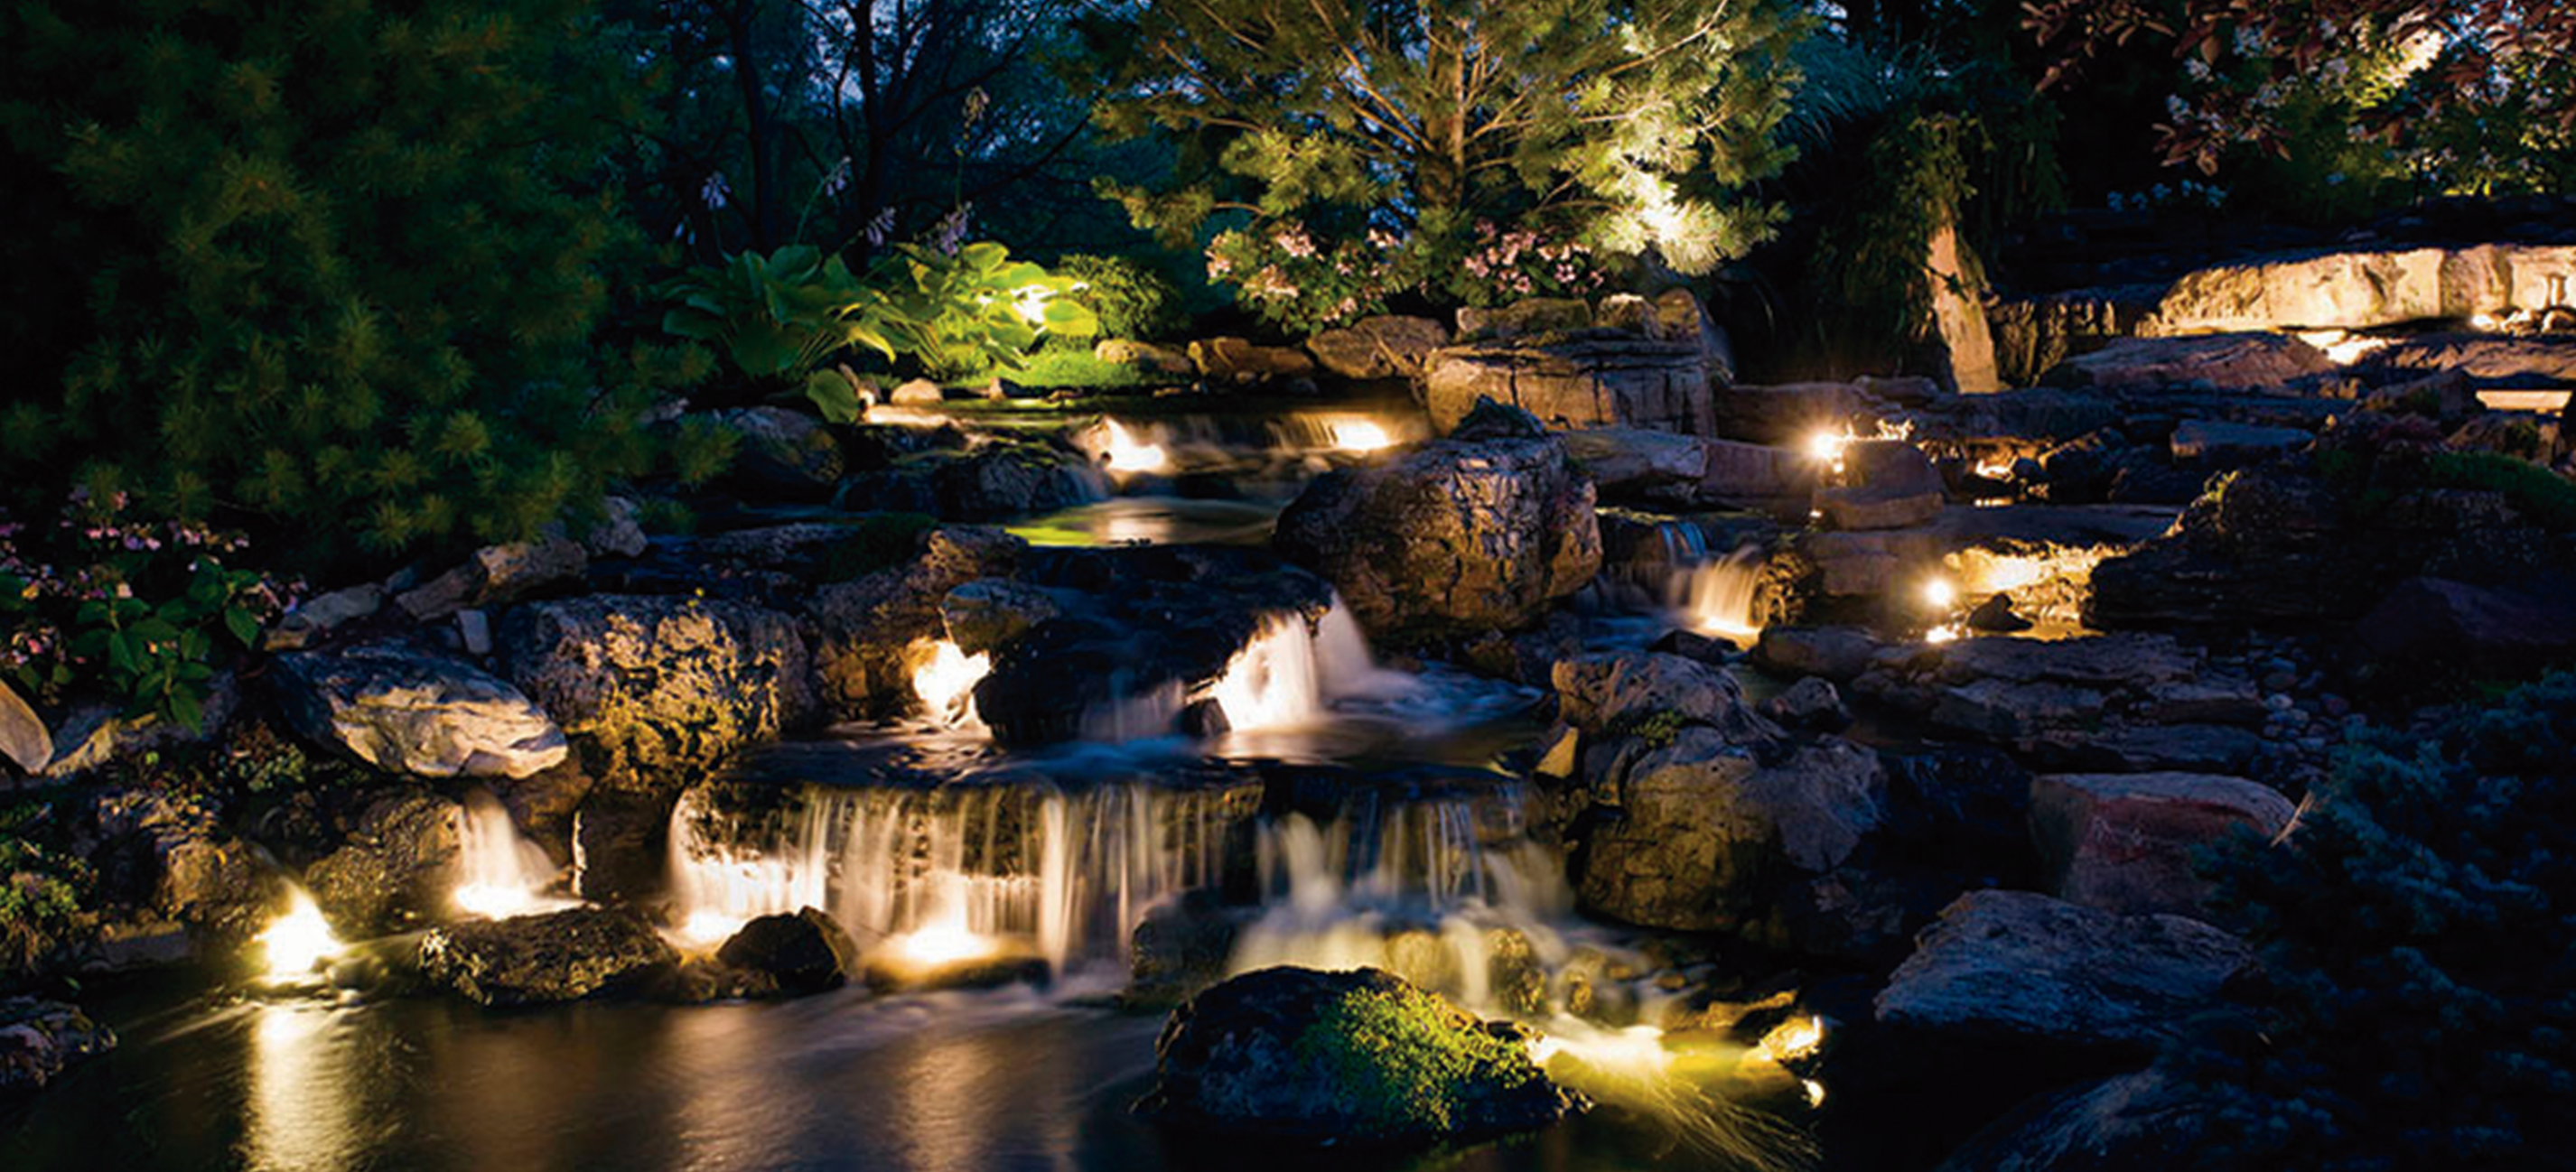 Iluminacion de jardines fotos croquis iluminacion jardin for Iluminar jardin sin electricidad